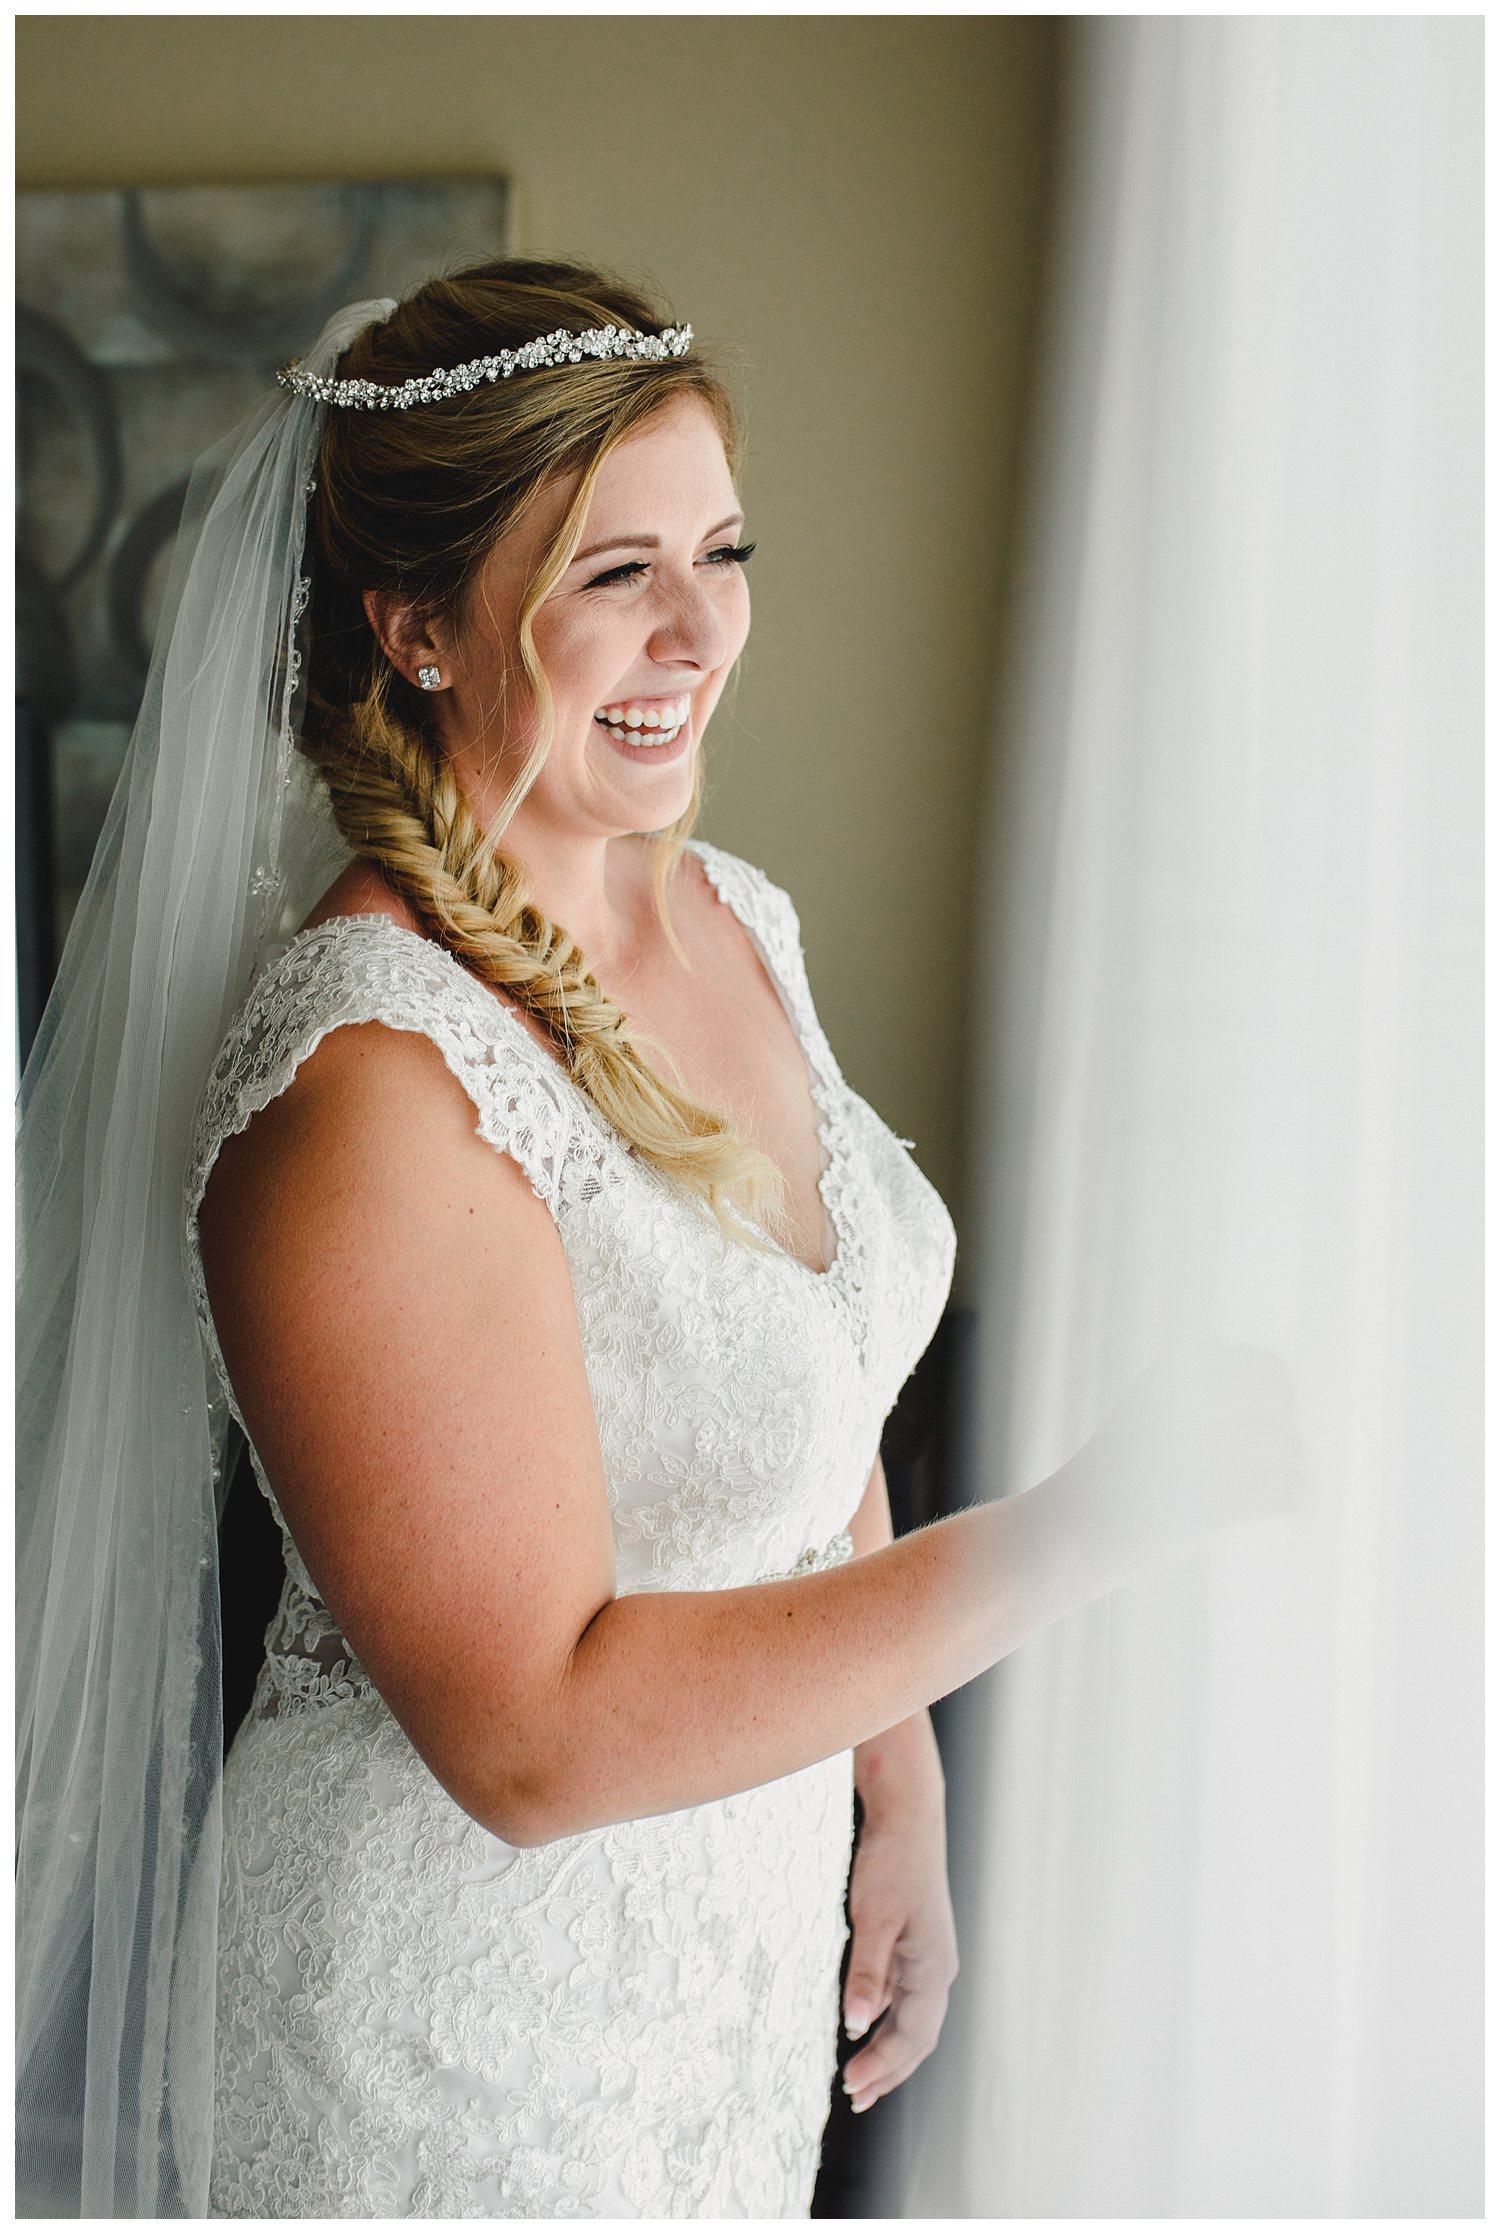 Kelsey_Diane_Photography_Destination_Wedding_Sarasota_Florida_Beach_Wedding_Alex_Austin_0627.jpg